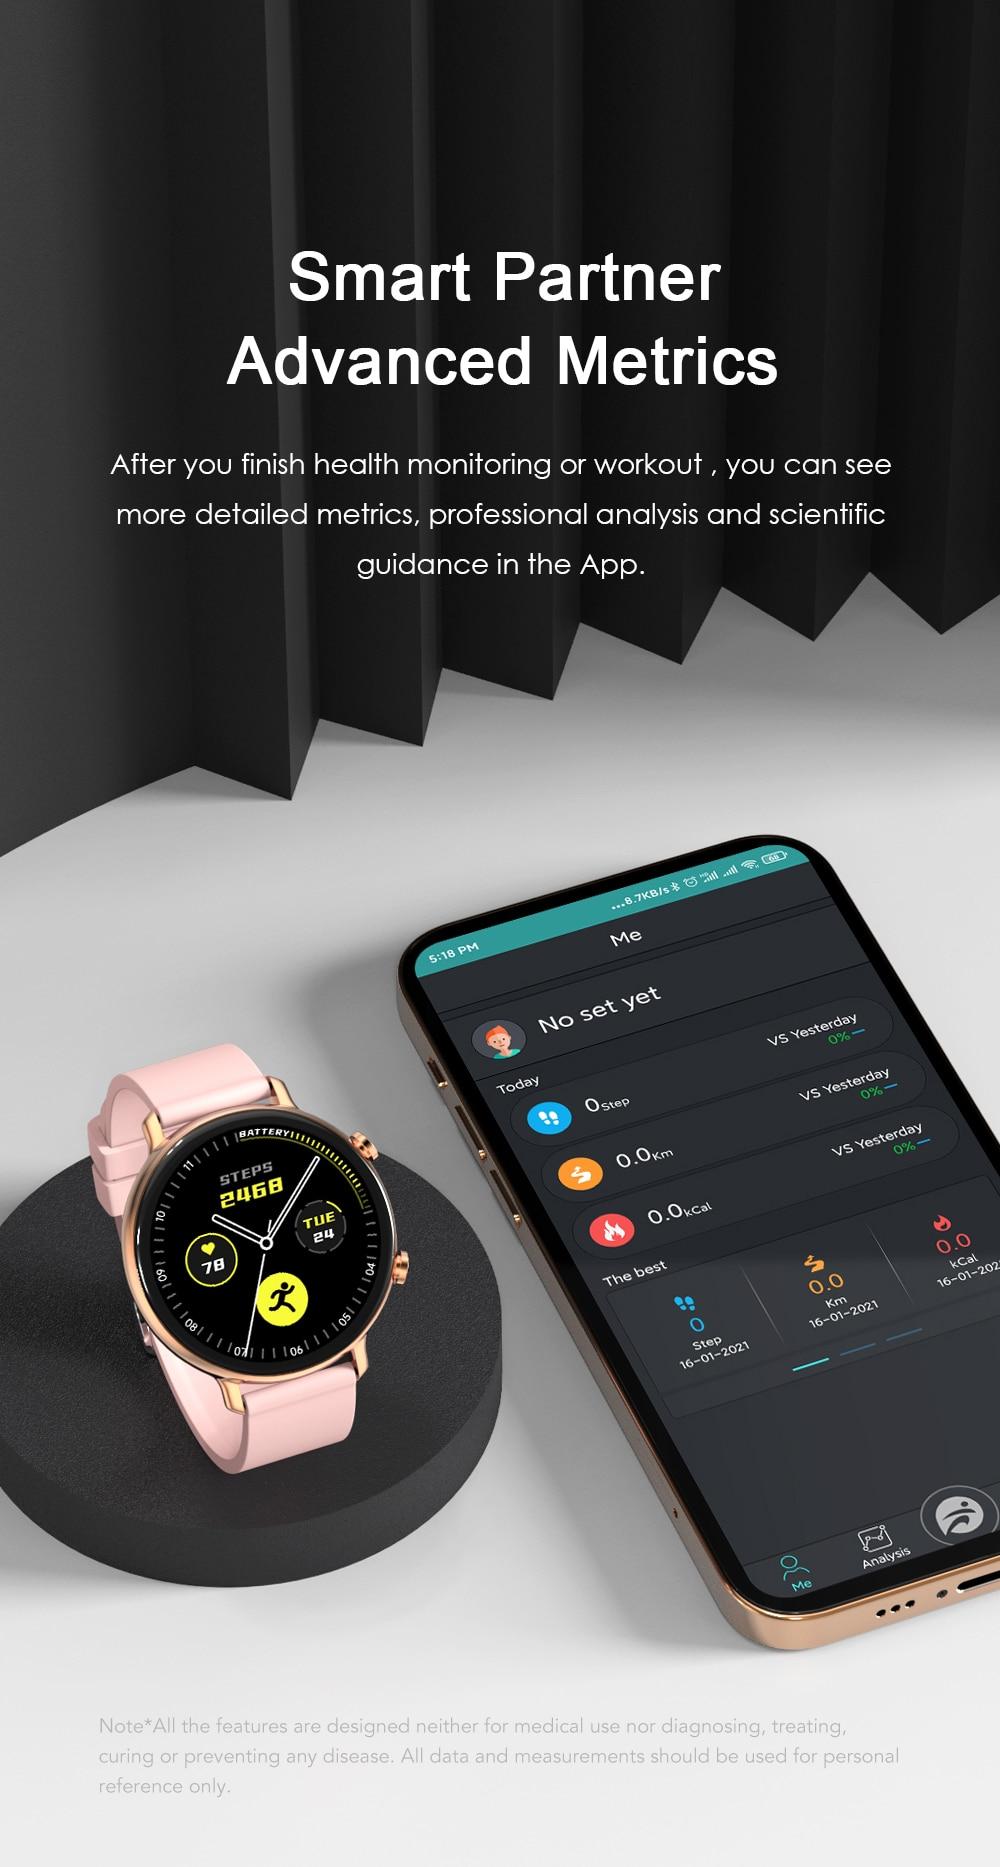 H5fdce9e87ca8449aa11296c11d9c5d24E SANLEPUS 2021 Smart Watch Dial Calls Men Women Waterproof Smartwatch ECG PPG Fitness Bracelet Band For Android Apple Xiaomi